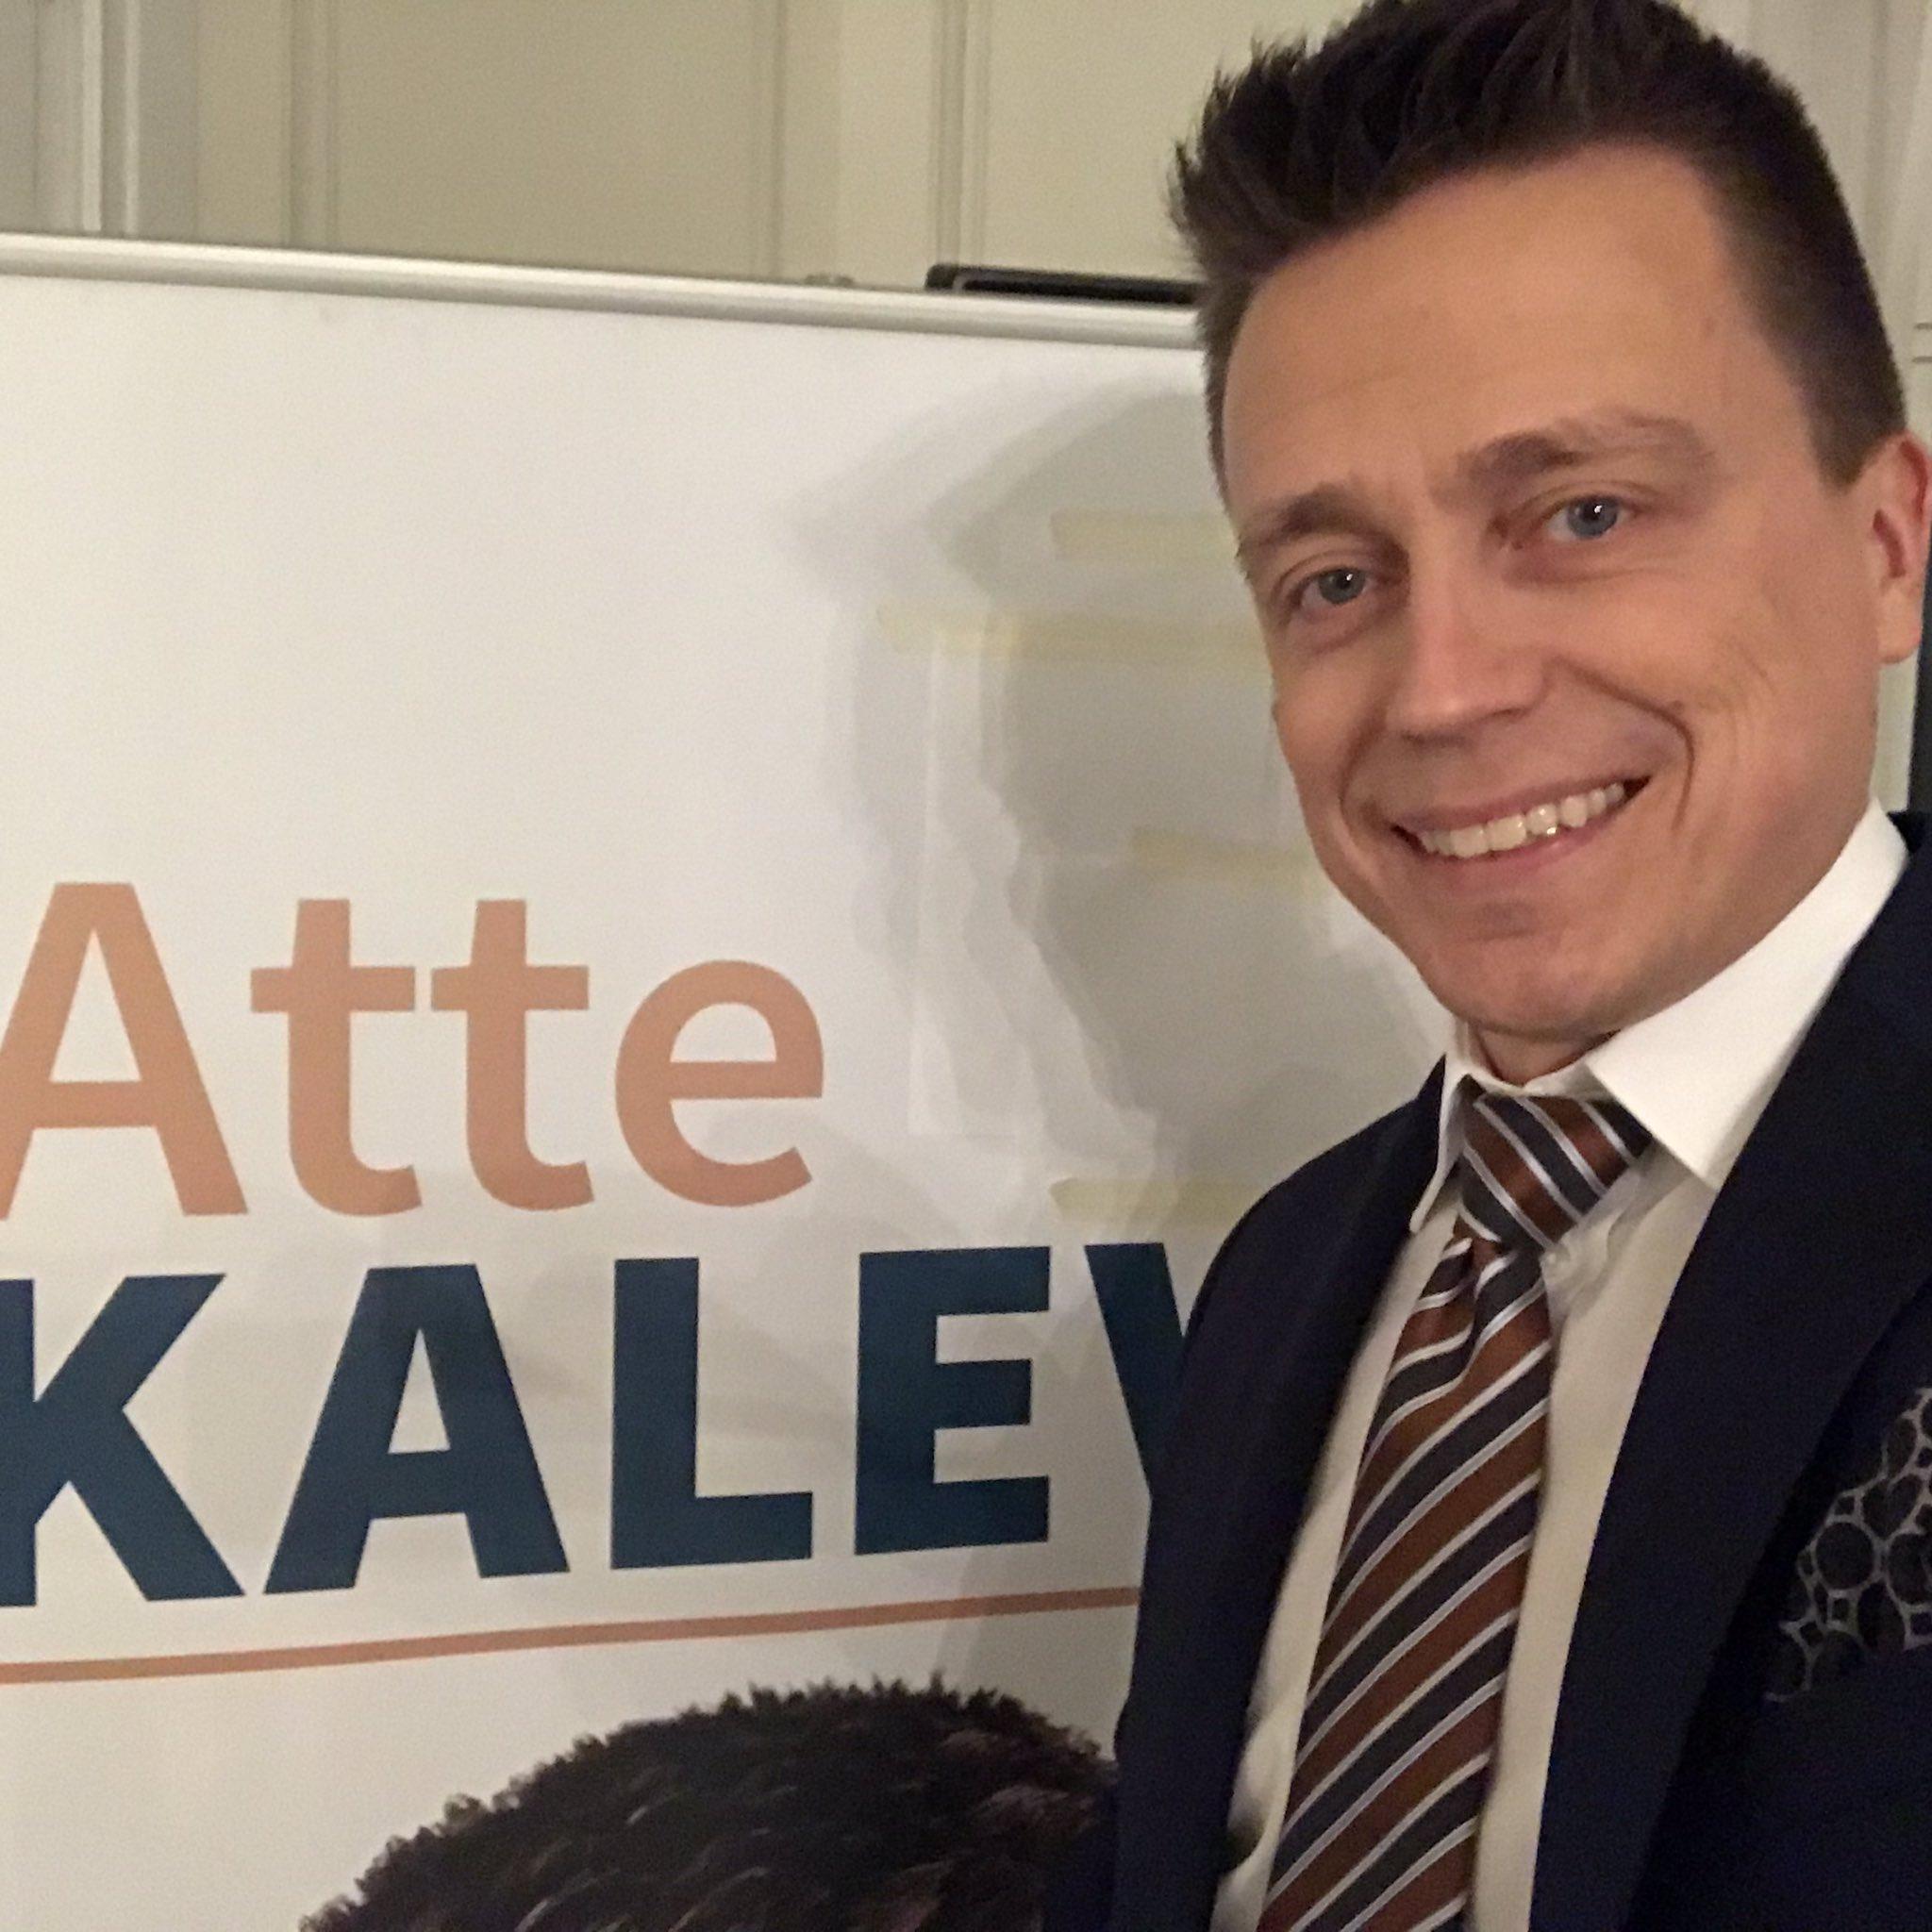 Atte Kaleva Twitter